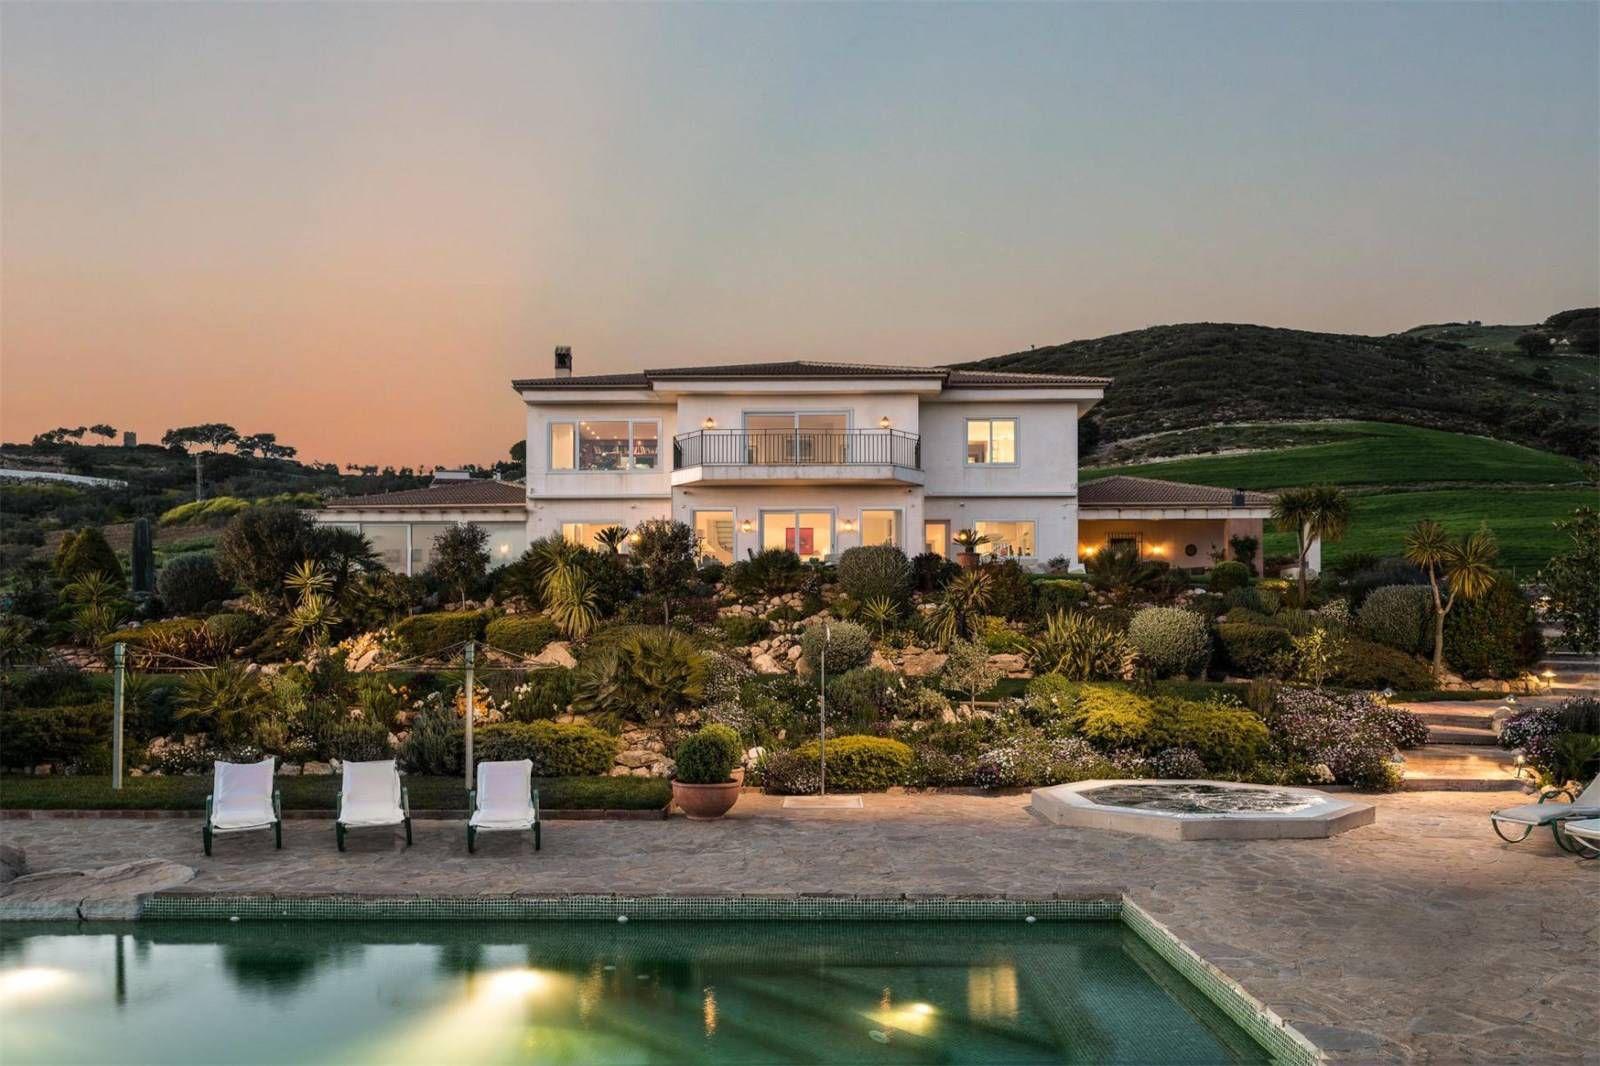 Юридическое оформление в Испании недвижимости фото 4